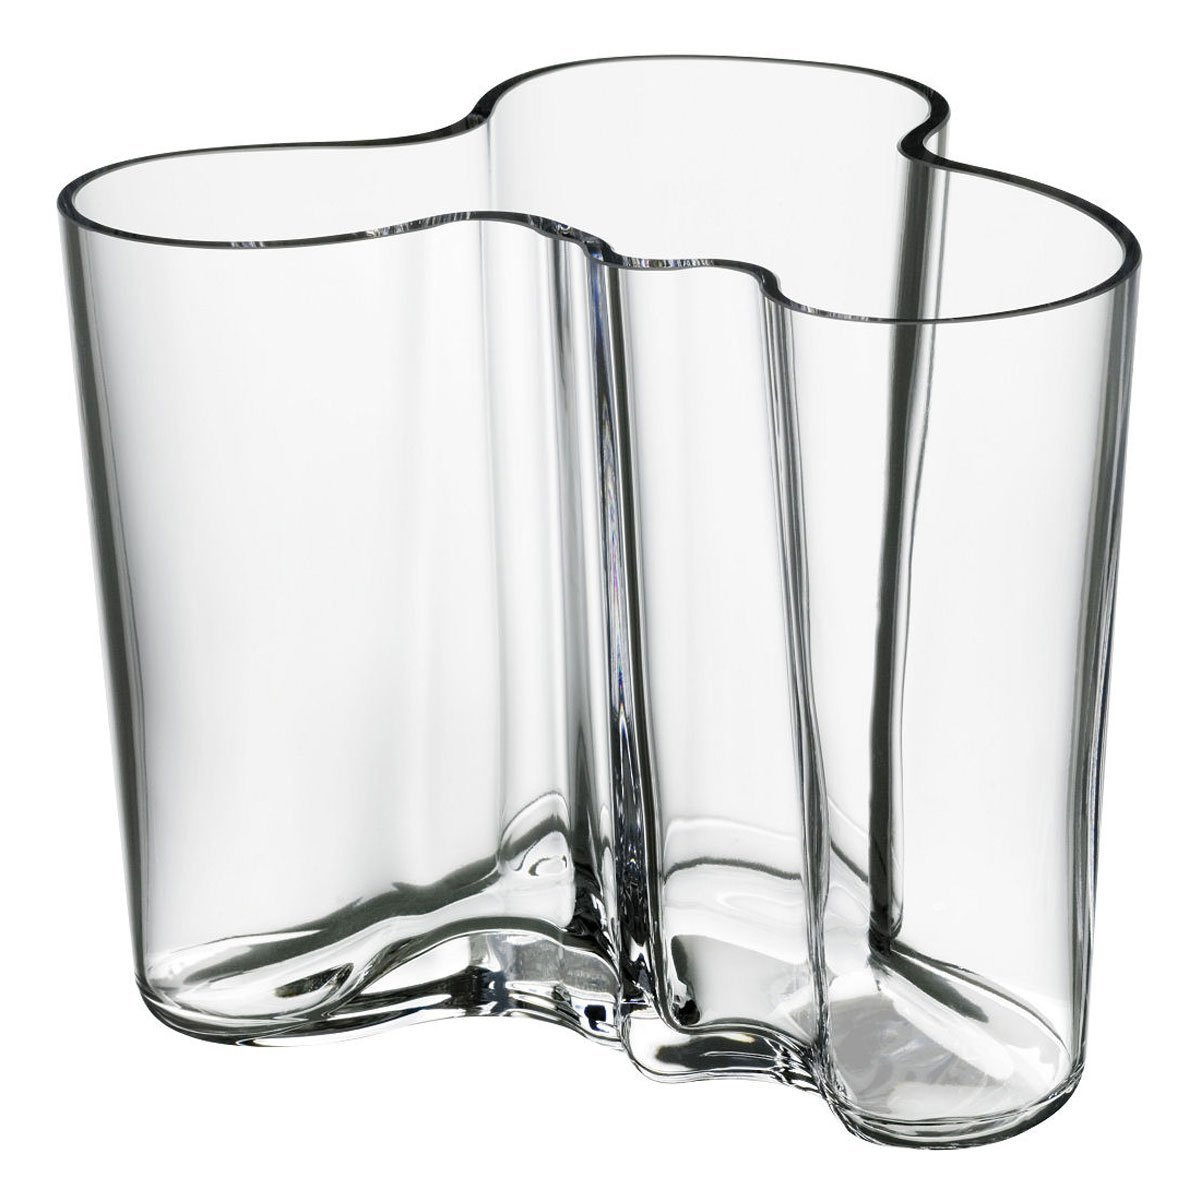 libbey clear cylinder bud vase of amazon com iittala alvar aalto vase 120mm 4 74 clear home kitchen in 61cg wwki8l sl1201